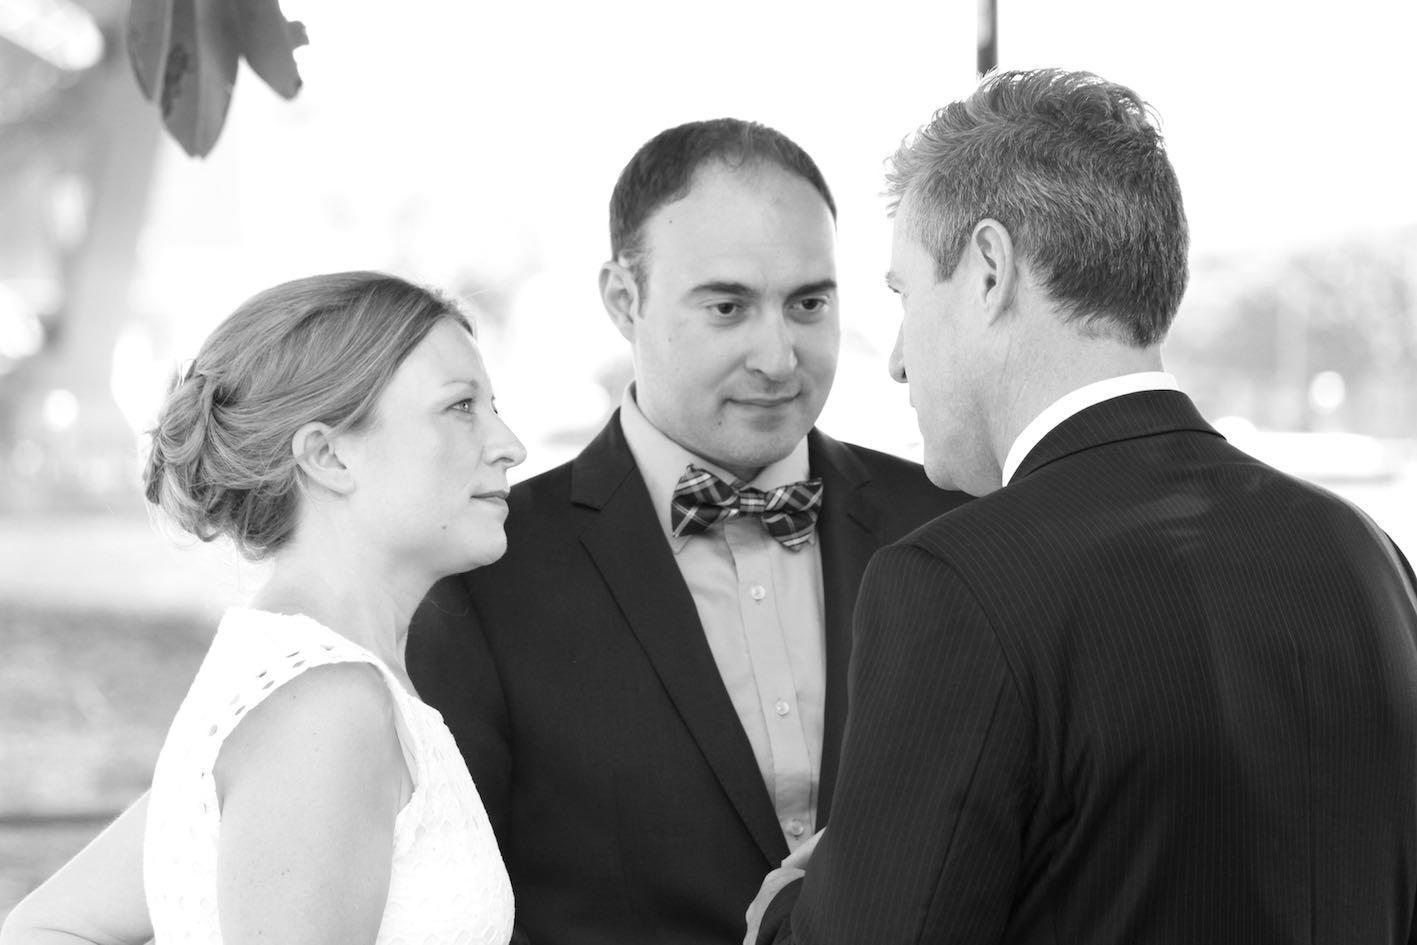 Simple-Ceremonies_Marriage Celebrant_Wedding-celebrant_Bradfield Park_North Sydney_NSW_Australia_SydneyHarbourweddingscheap10111